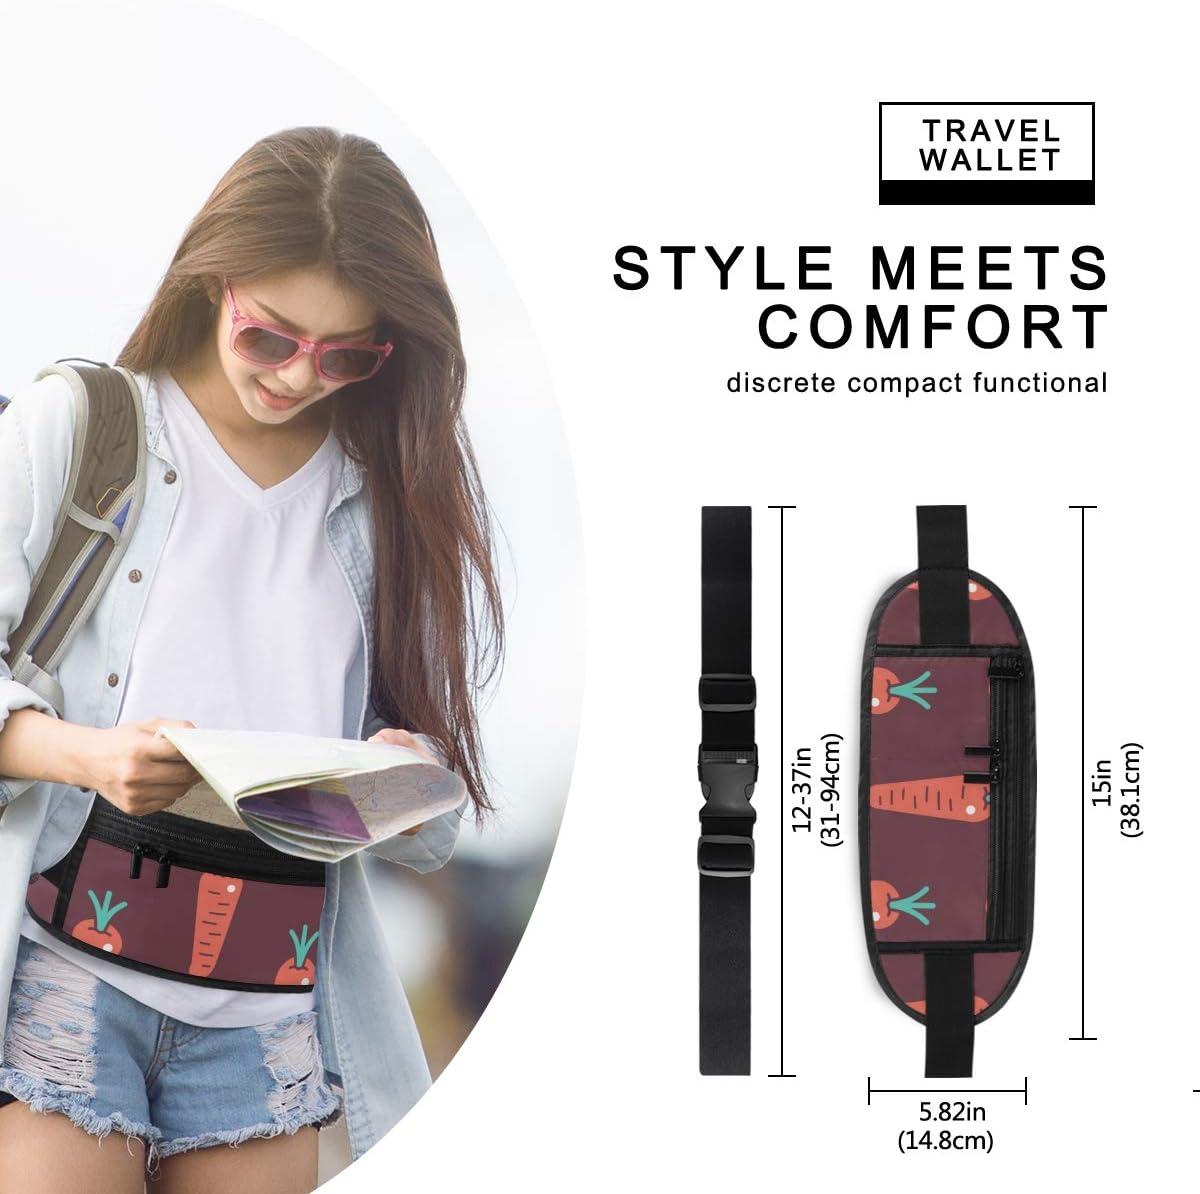 Travel Waist Pack,travel Pocket With Adjustable Belt Carrots Pattern Cartoon Sticker Style Running Lumbar Pack For Travel Outdoor Sports Walking